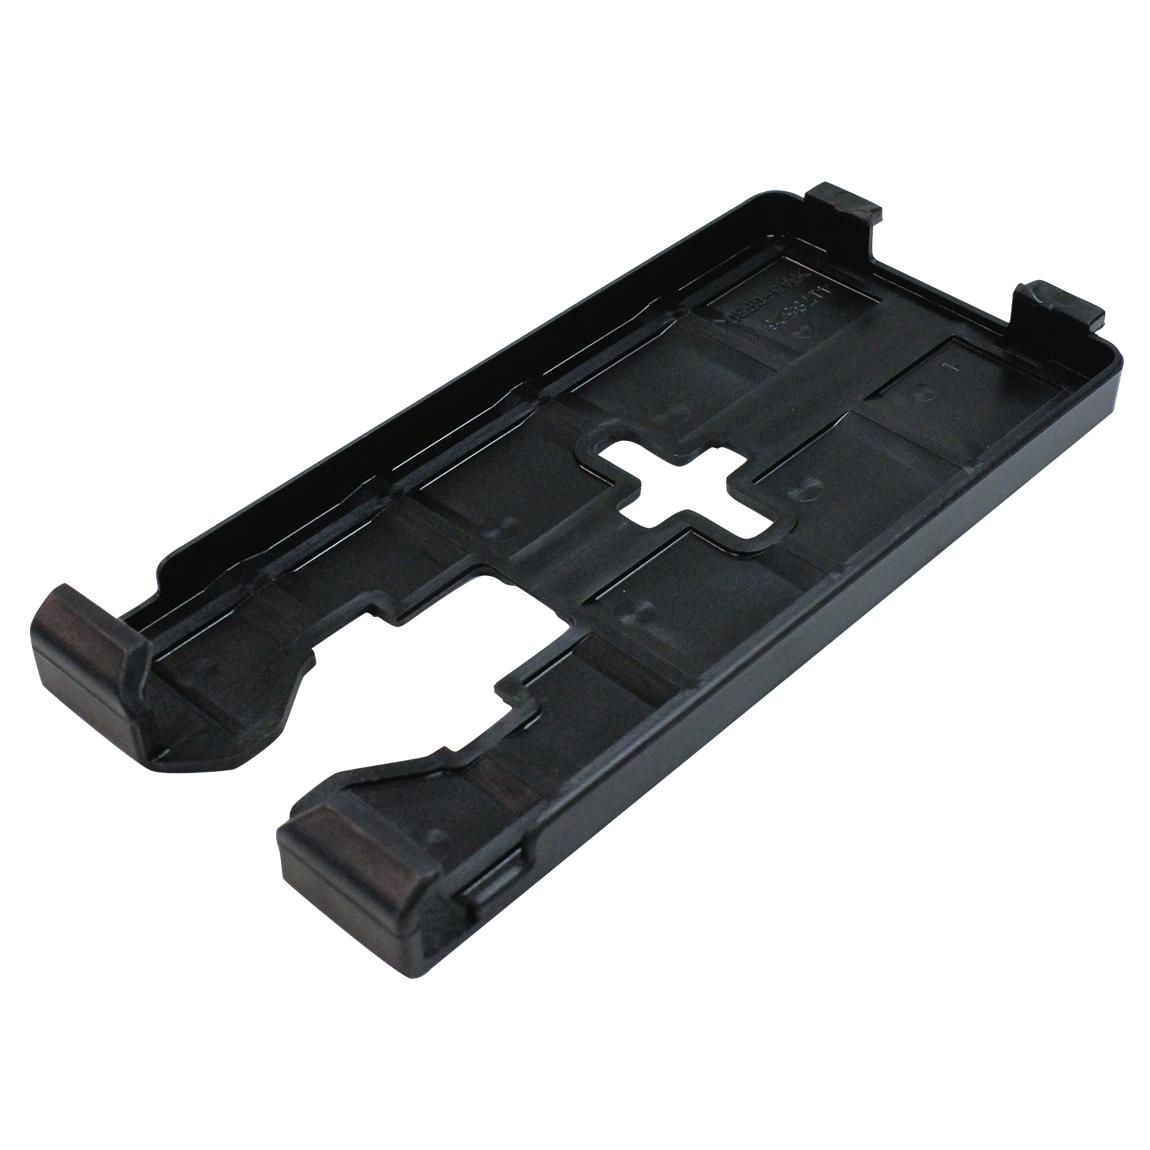 Пластиковая накладка для защиты от царапин Makita 417852-6